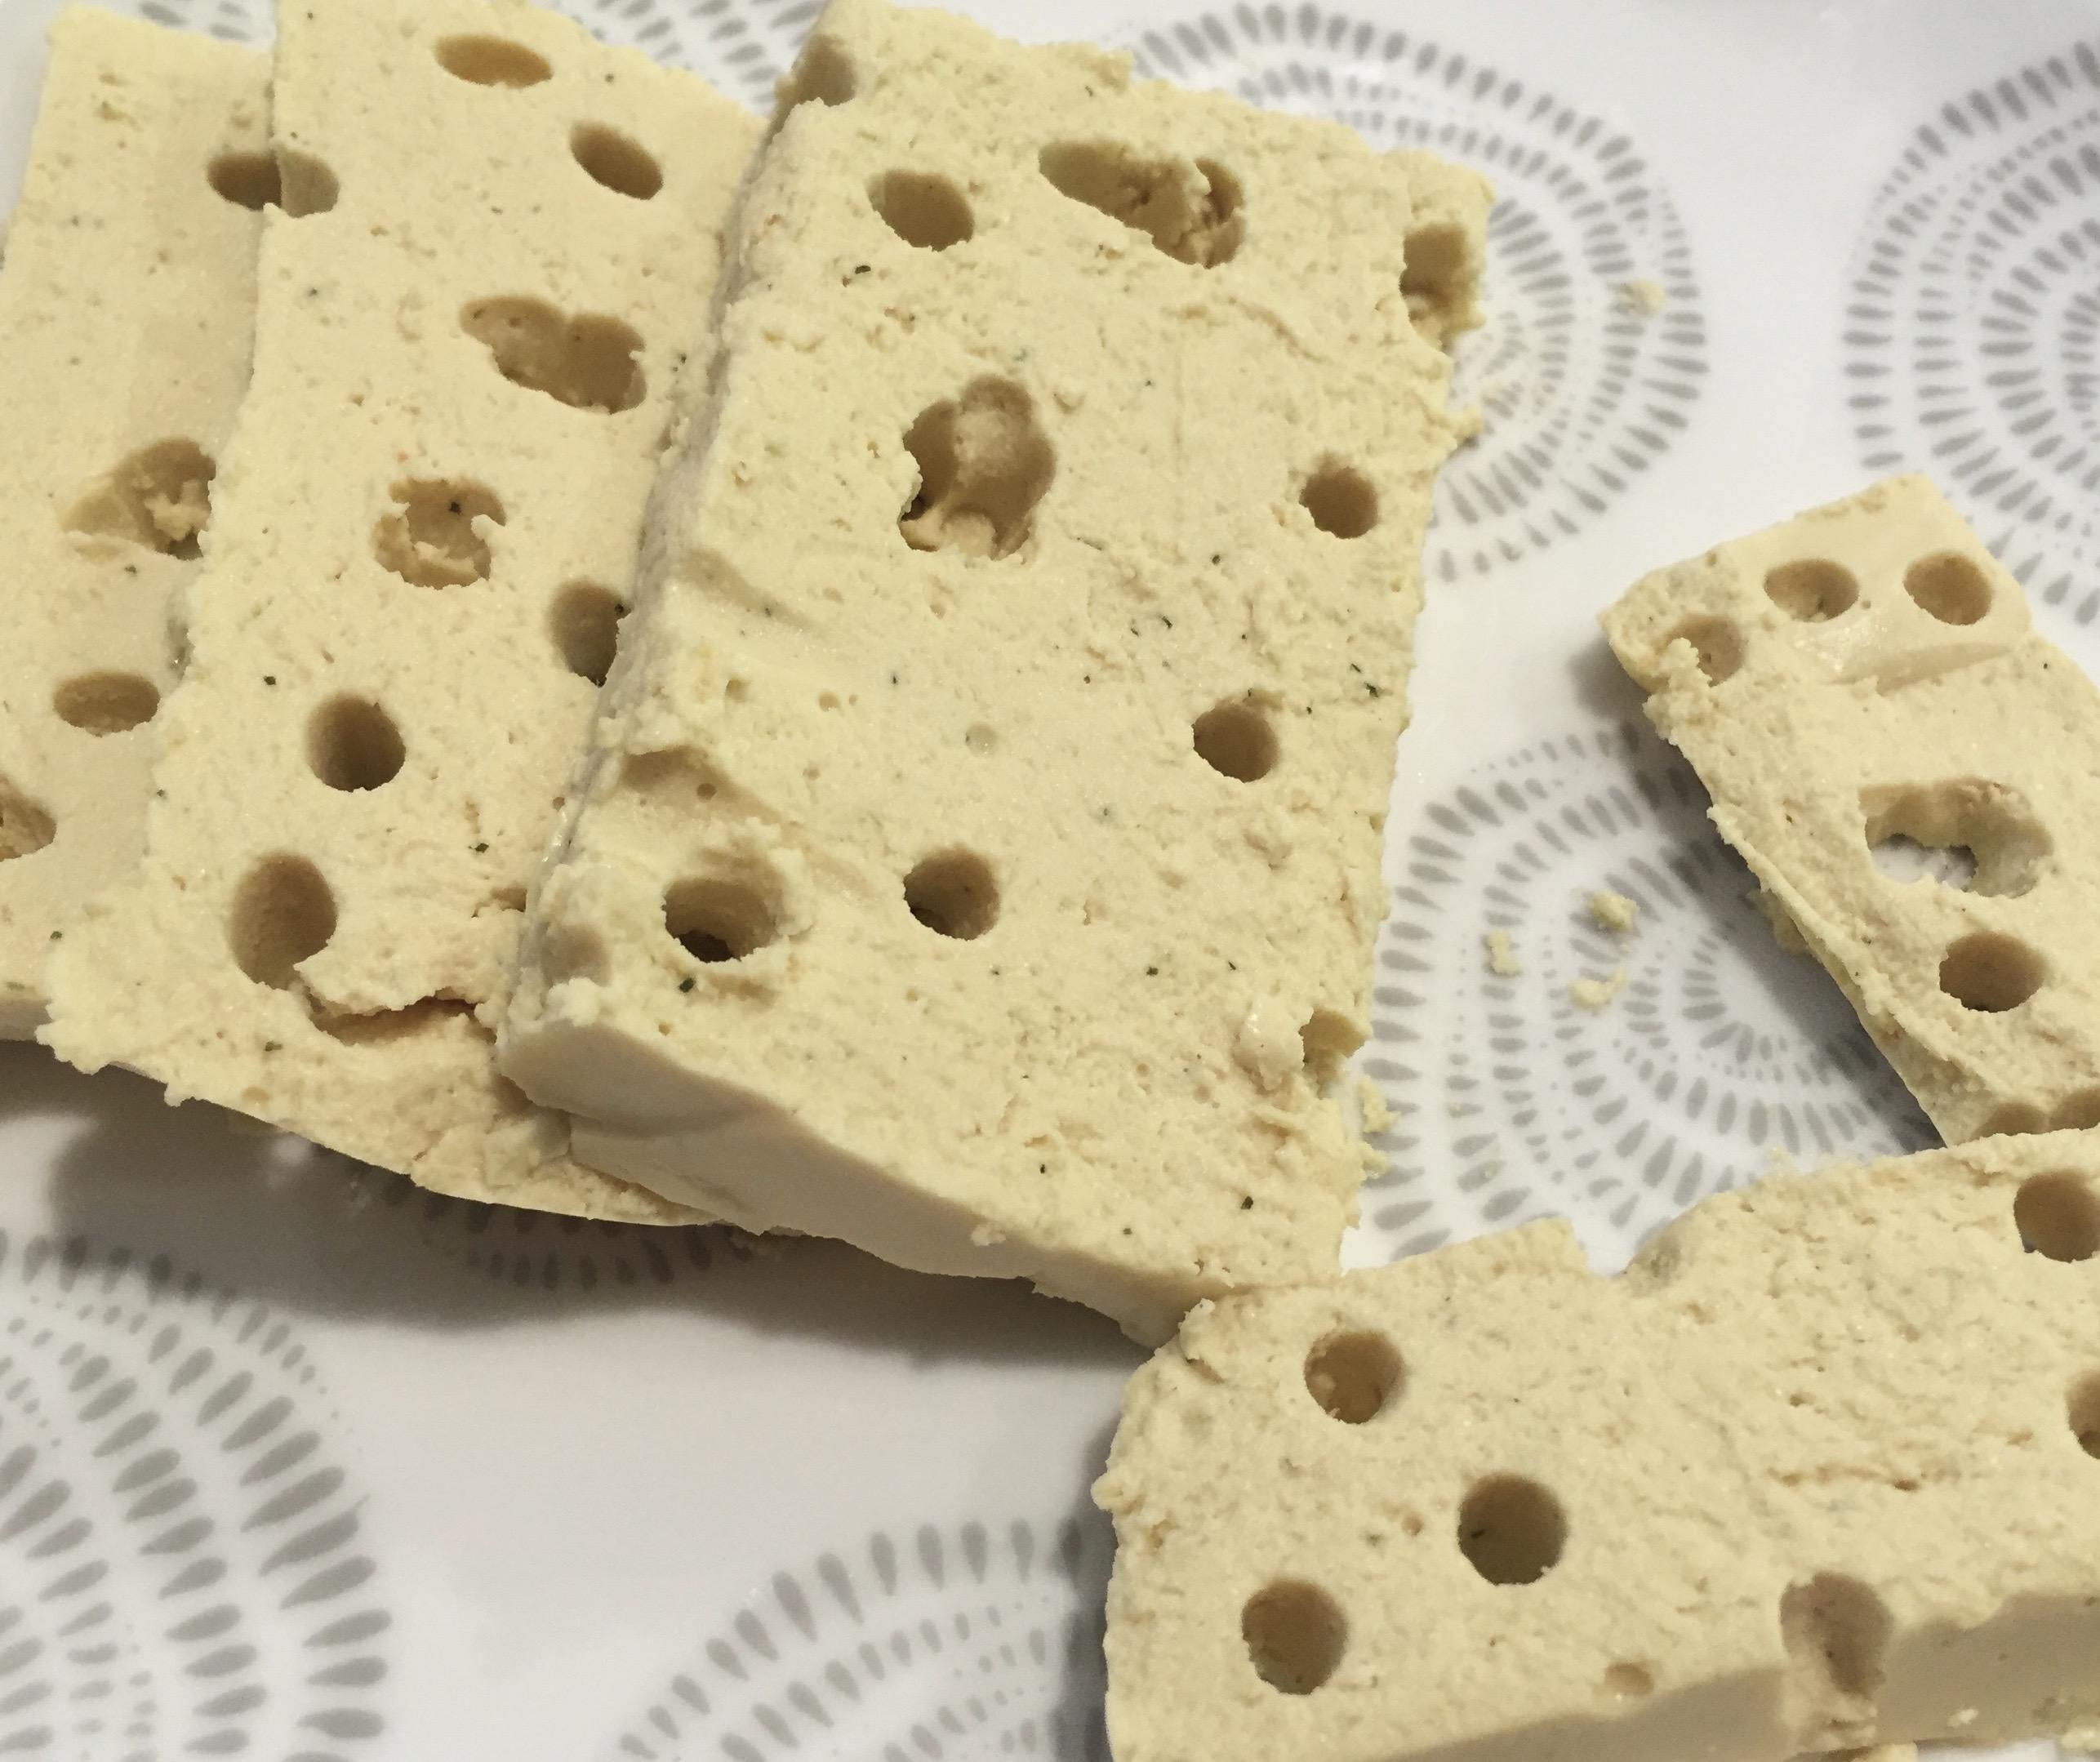 Swiss (non-dairy) Cheeze - Edible Musings | 2572 x 2158 jpeg 807kB